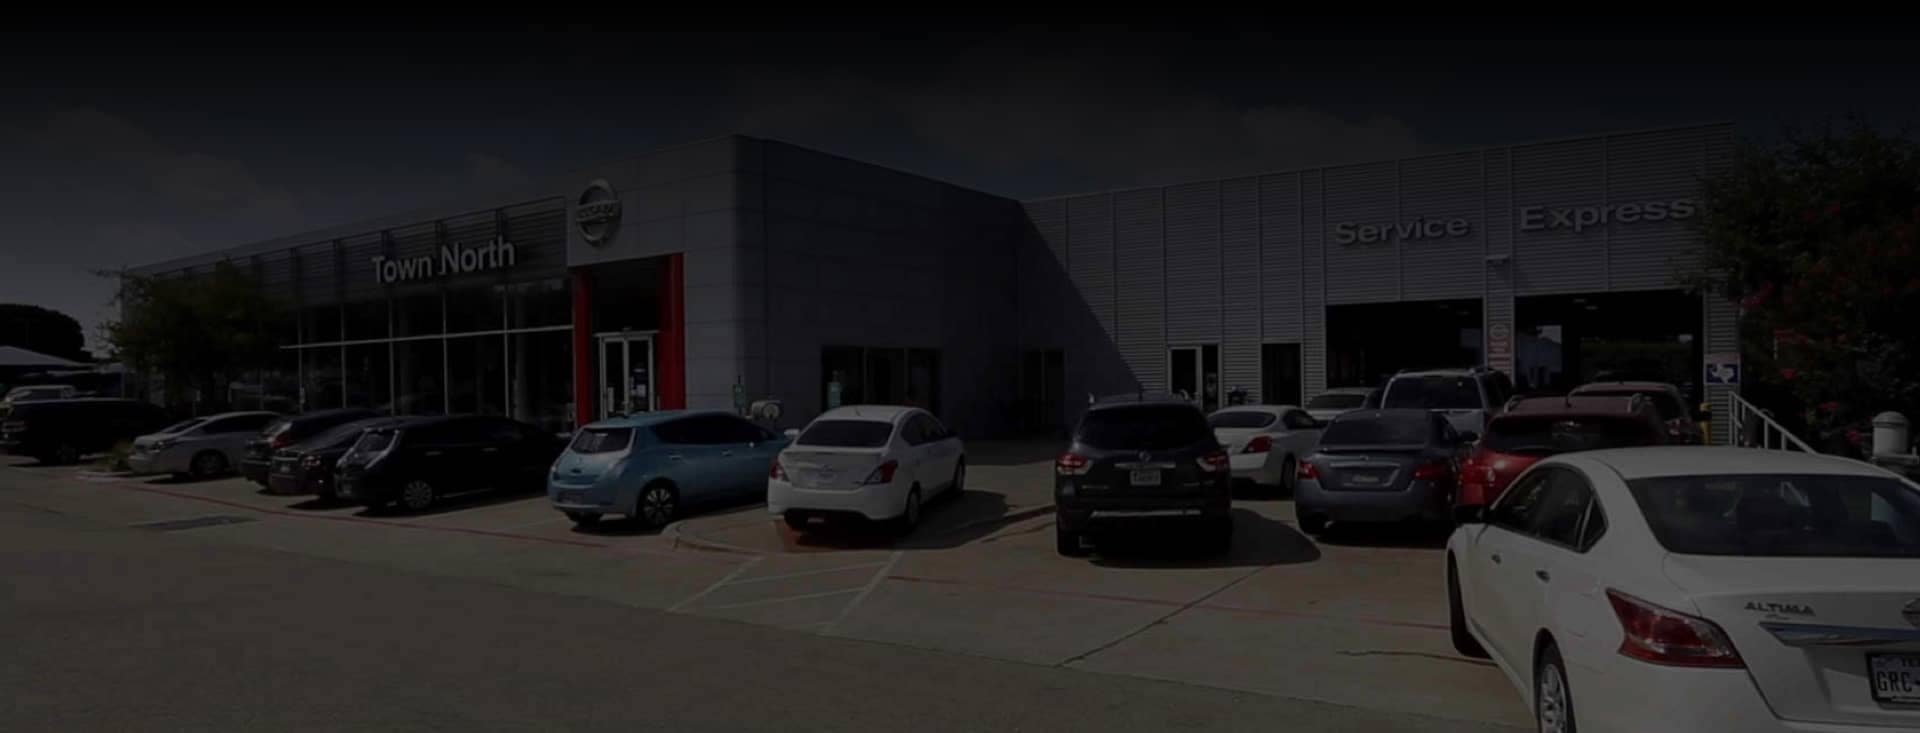 Town North Nissan dealership